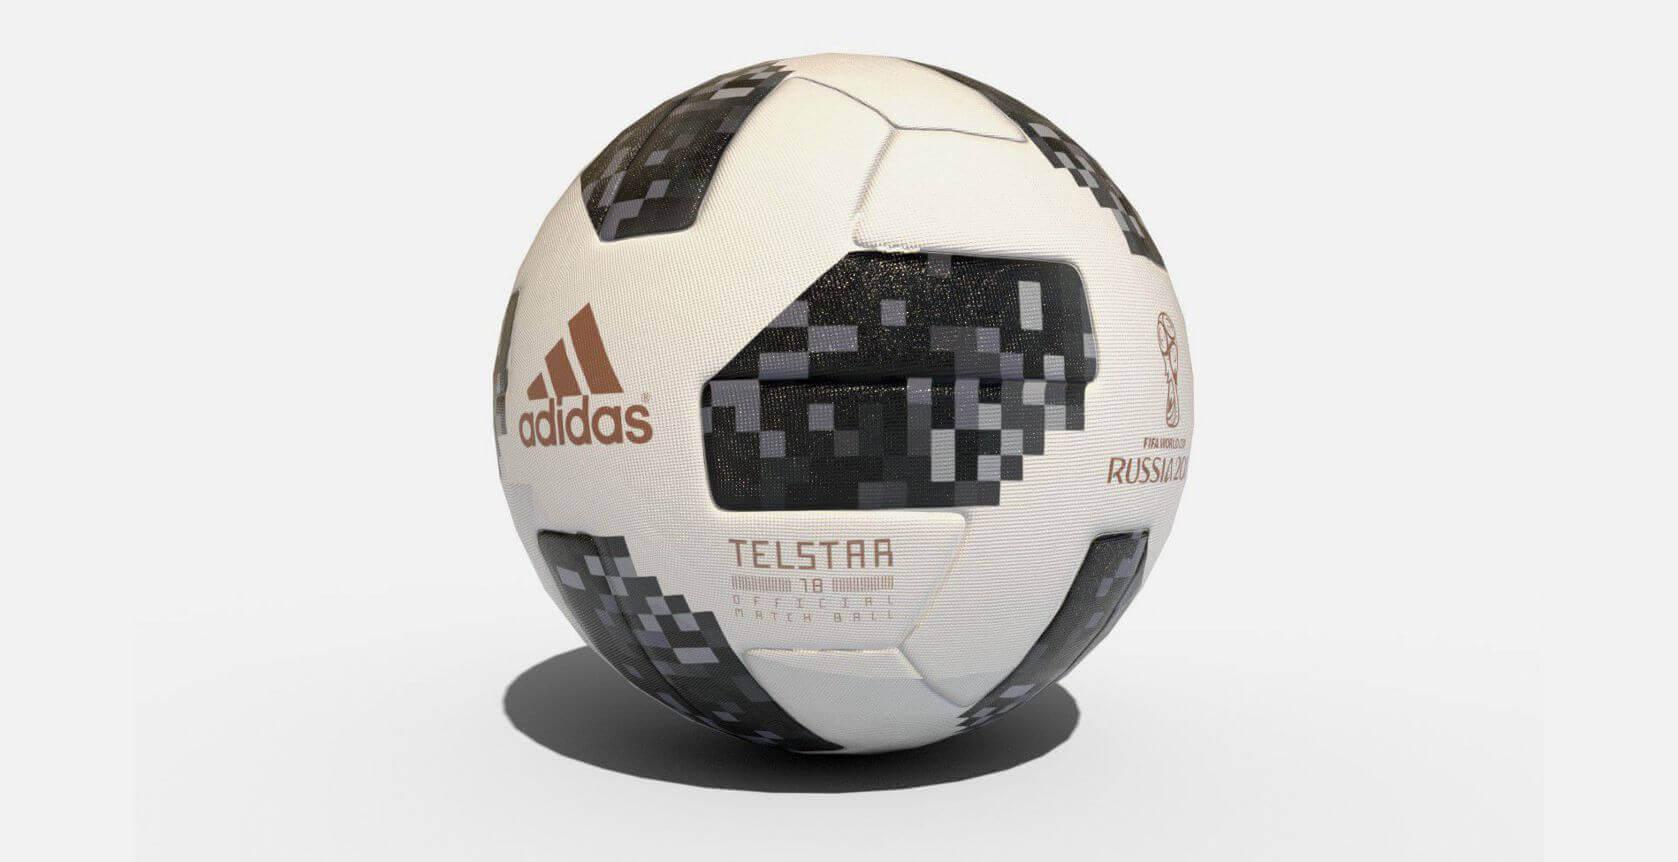 Beautiful Football Ball World Cup 2018 - telstar-2018-world-cup-ball-lowpoly-vr-ar-low-01  Gallery_577751 .jpg